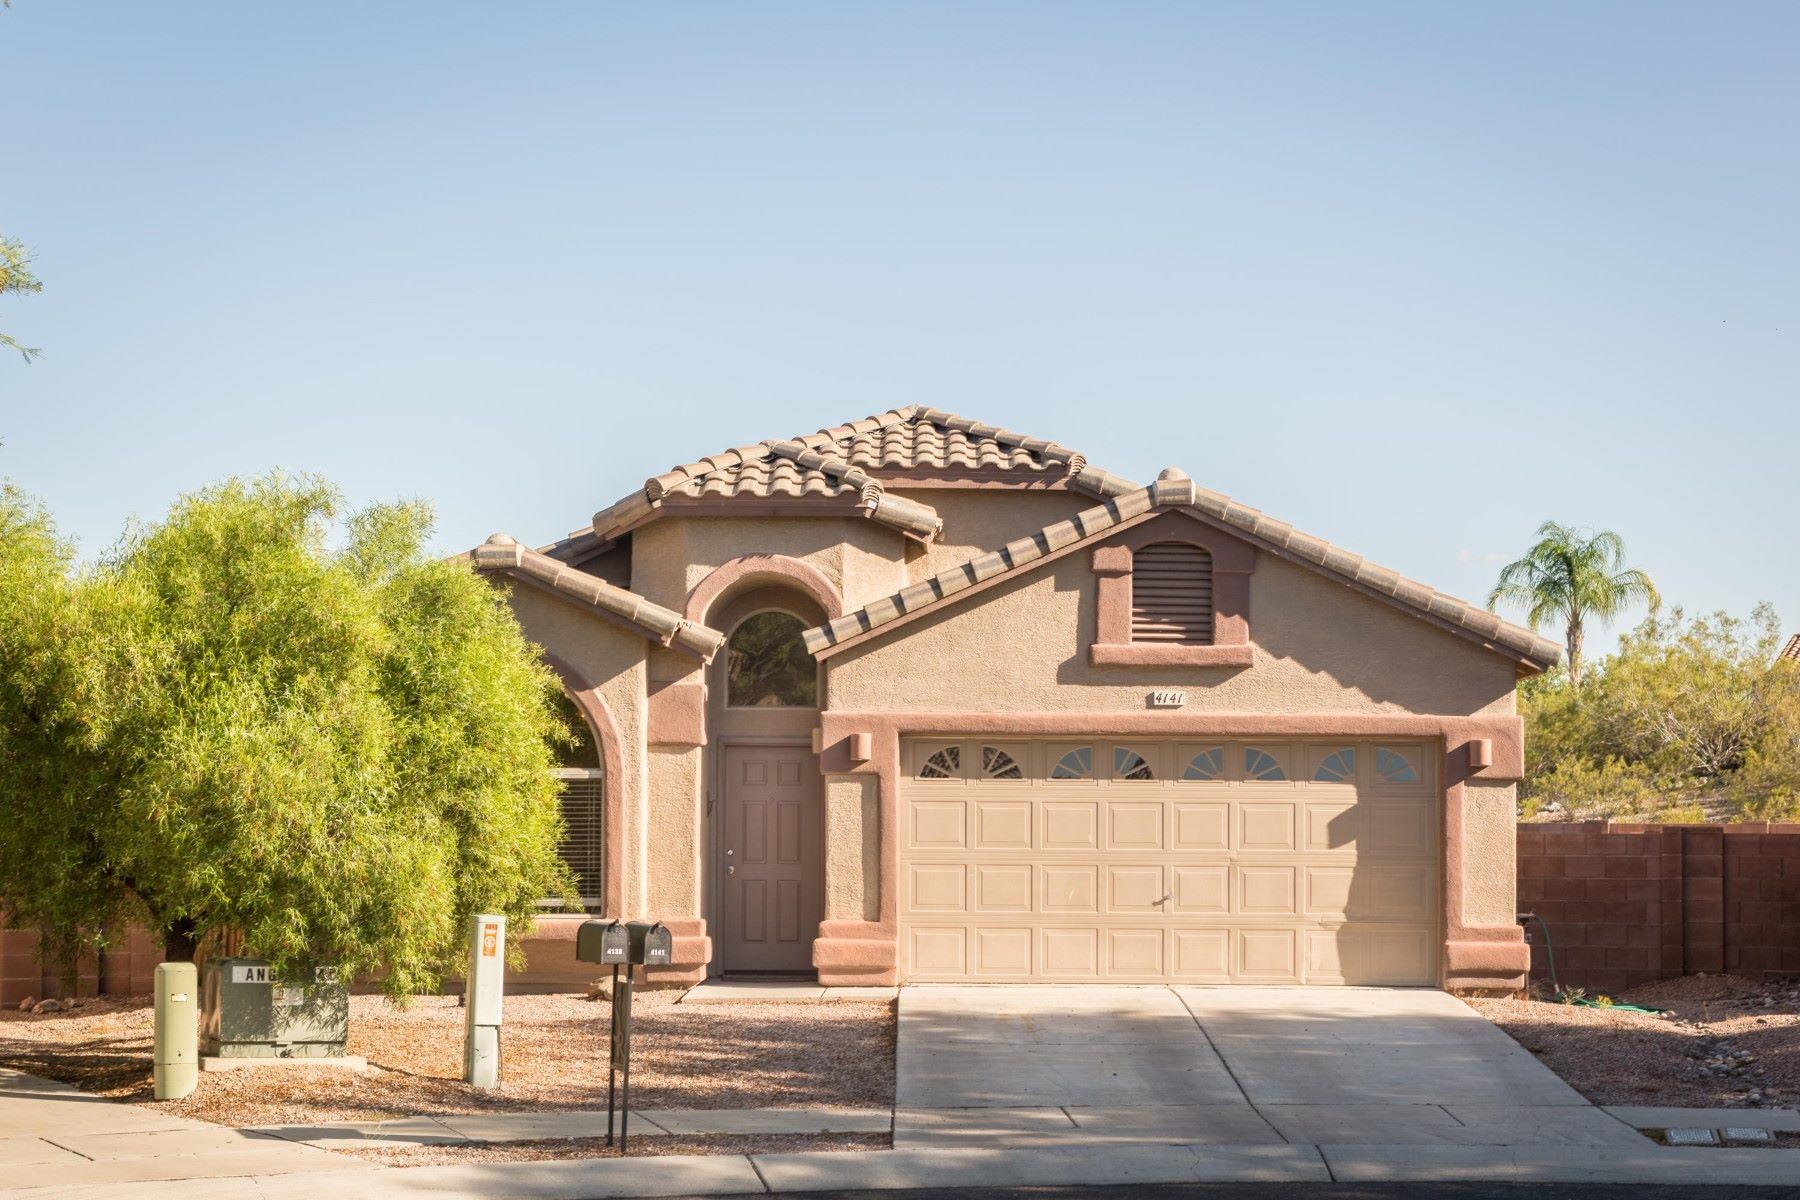 Casa para uma família para Venda às Beautiful well maintained home in the gated community of Sweetwater Reserve 4141 W GLANCE MINE PLACE Tucson, Arizona, 85745 Estados Unidos